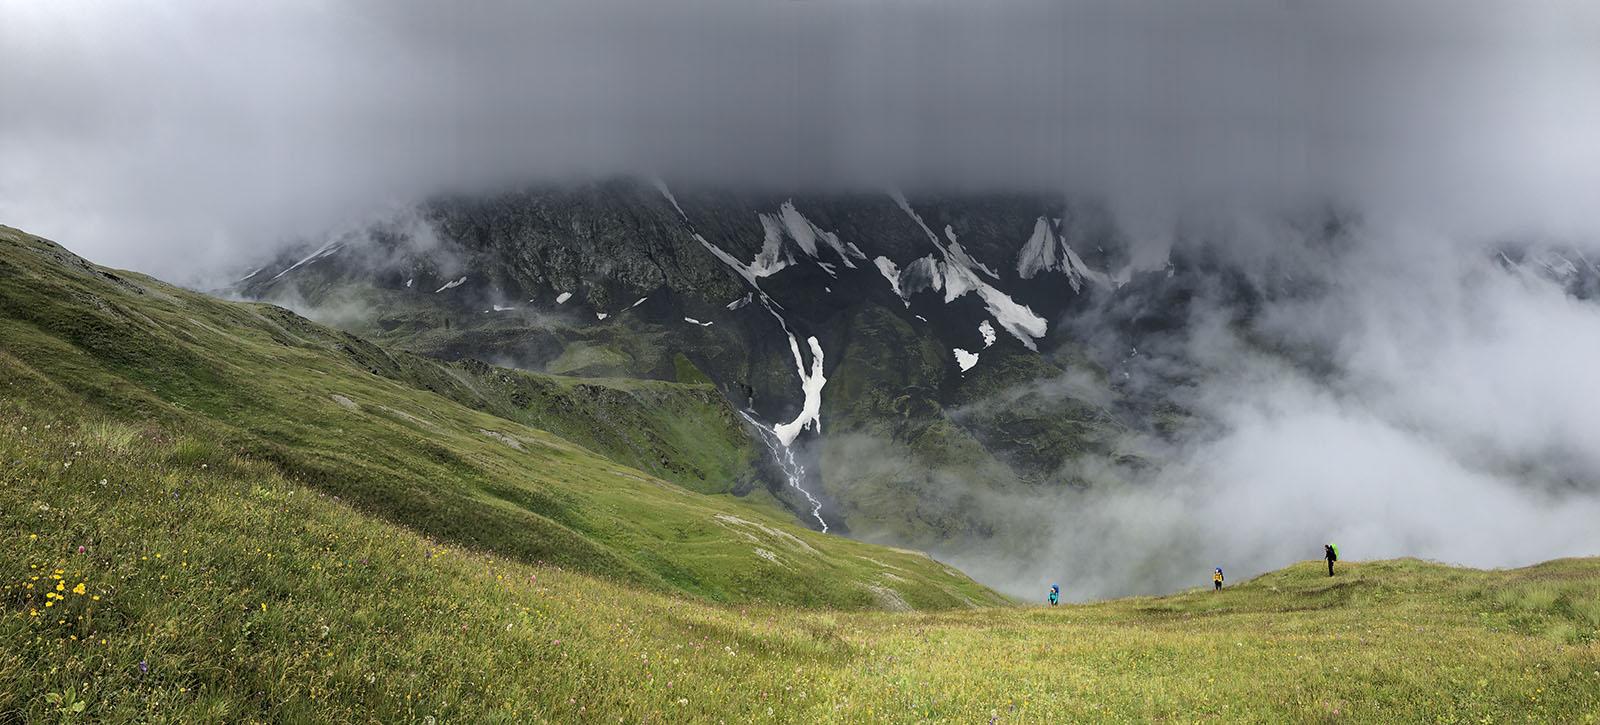 на подъеме к перевал Дзамараш